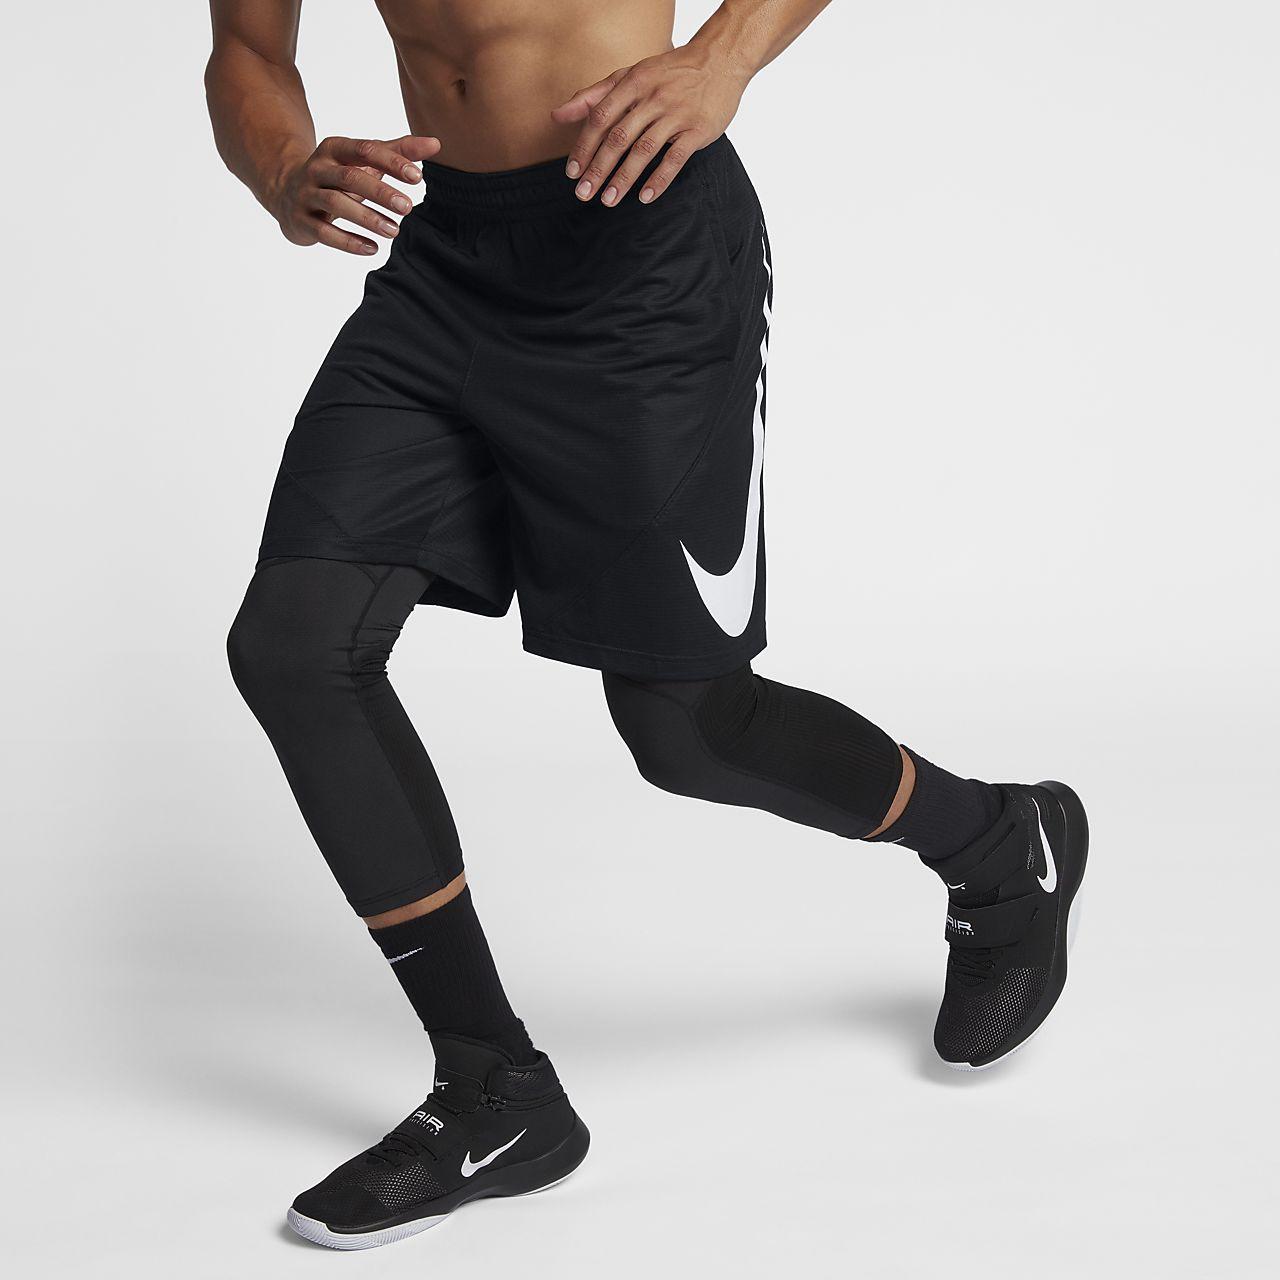 Be Short Pour Nike Cm 23 Basketball De Homme axaOTfRq